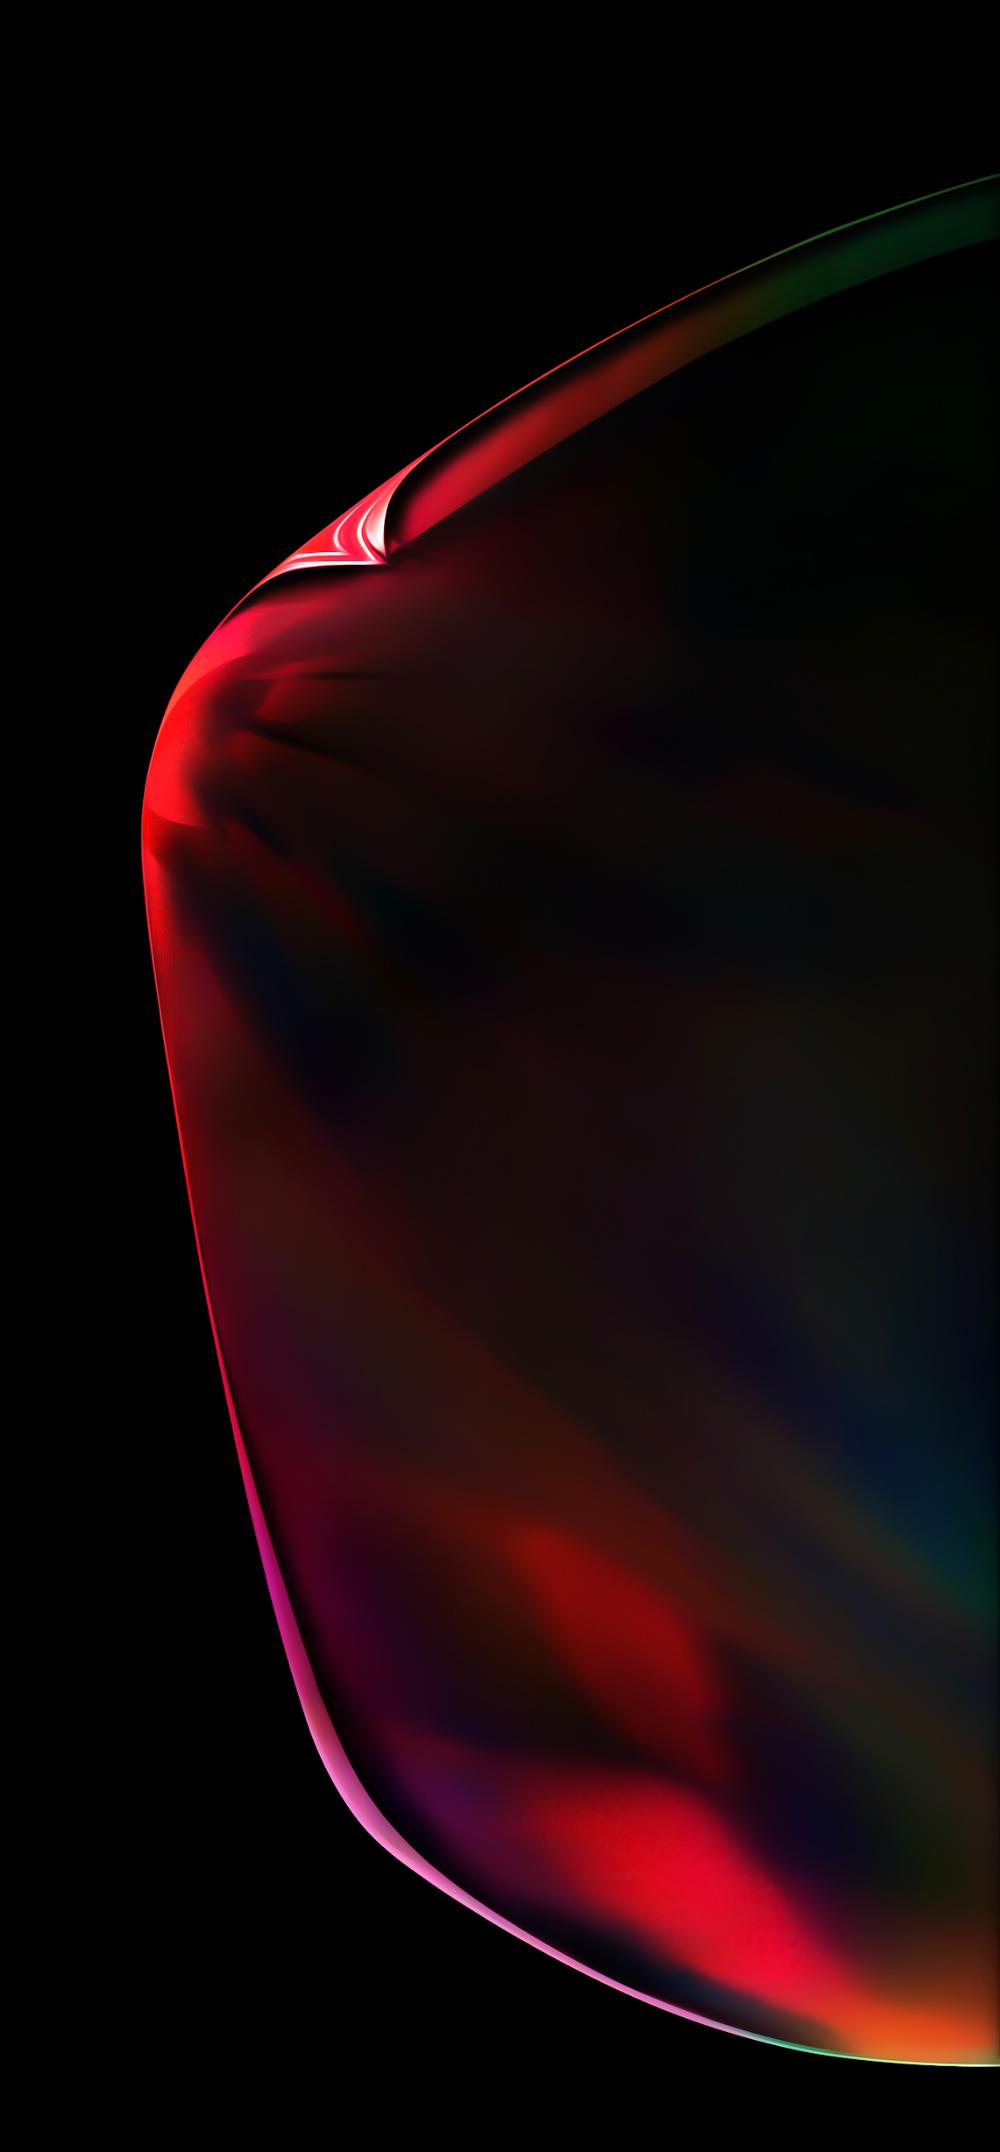 """OnePlus 7 Pro Wallpapers Google 相册"